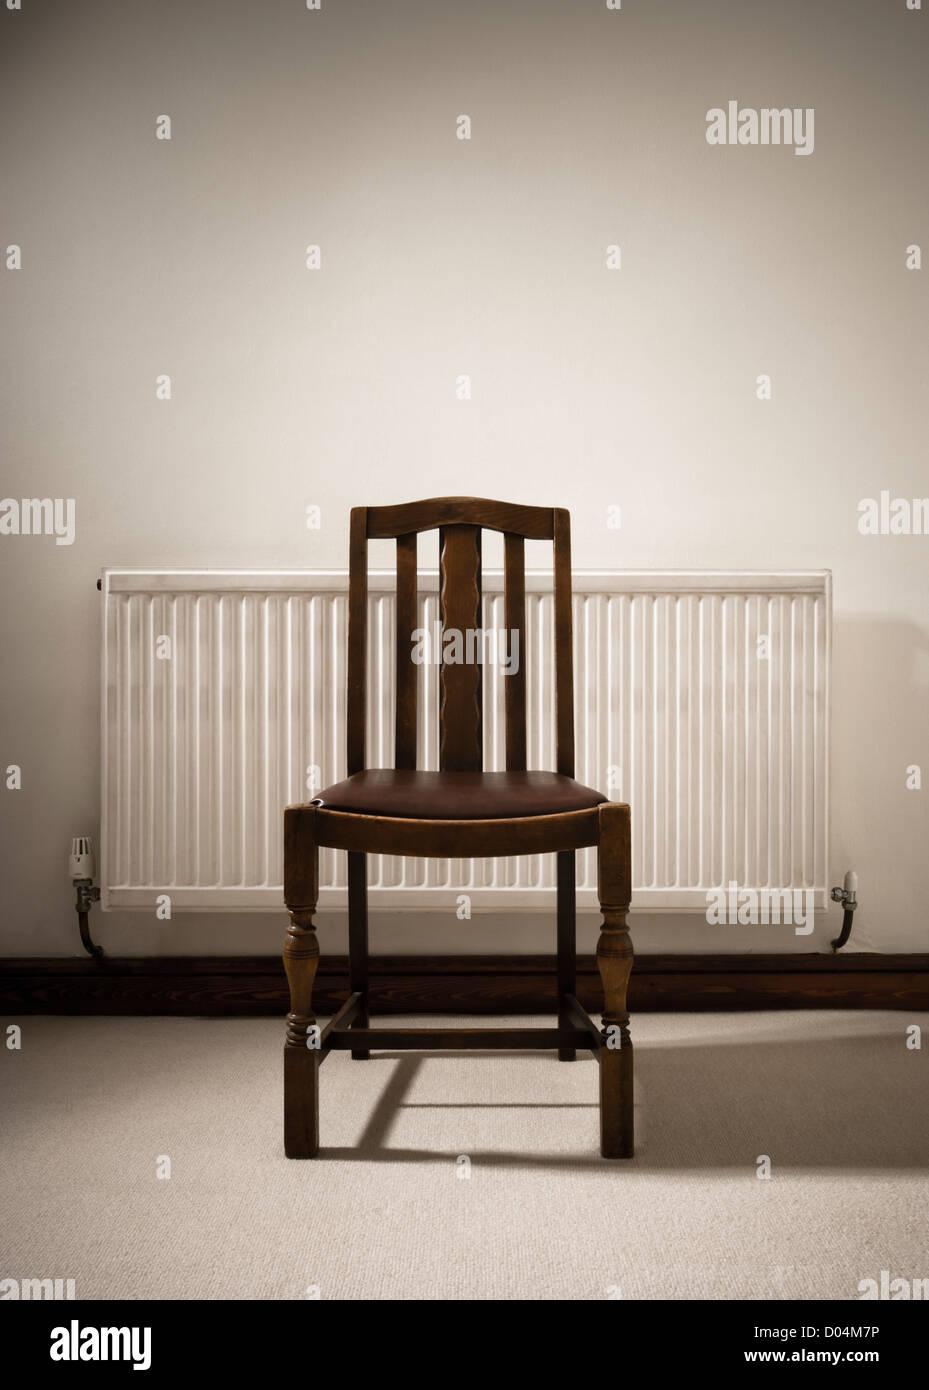 Chair and radiator. - Stock Image